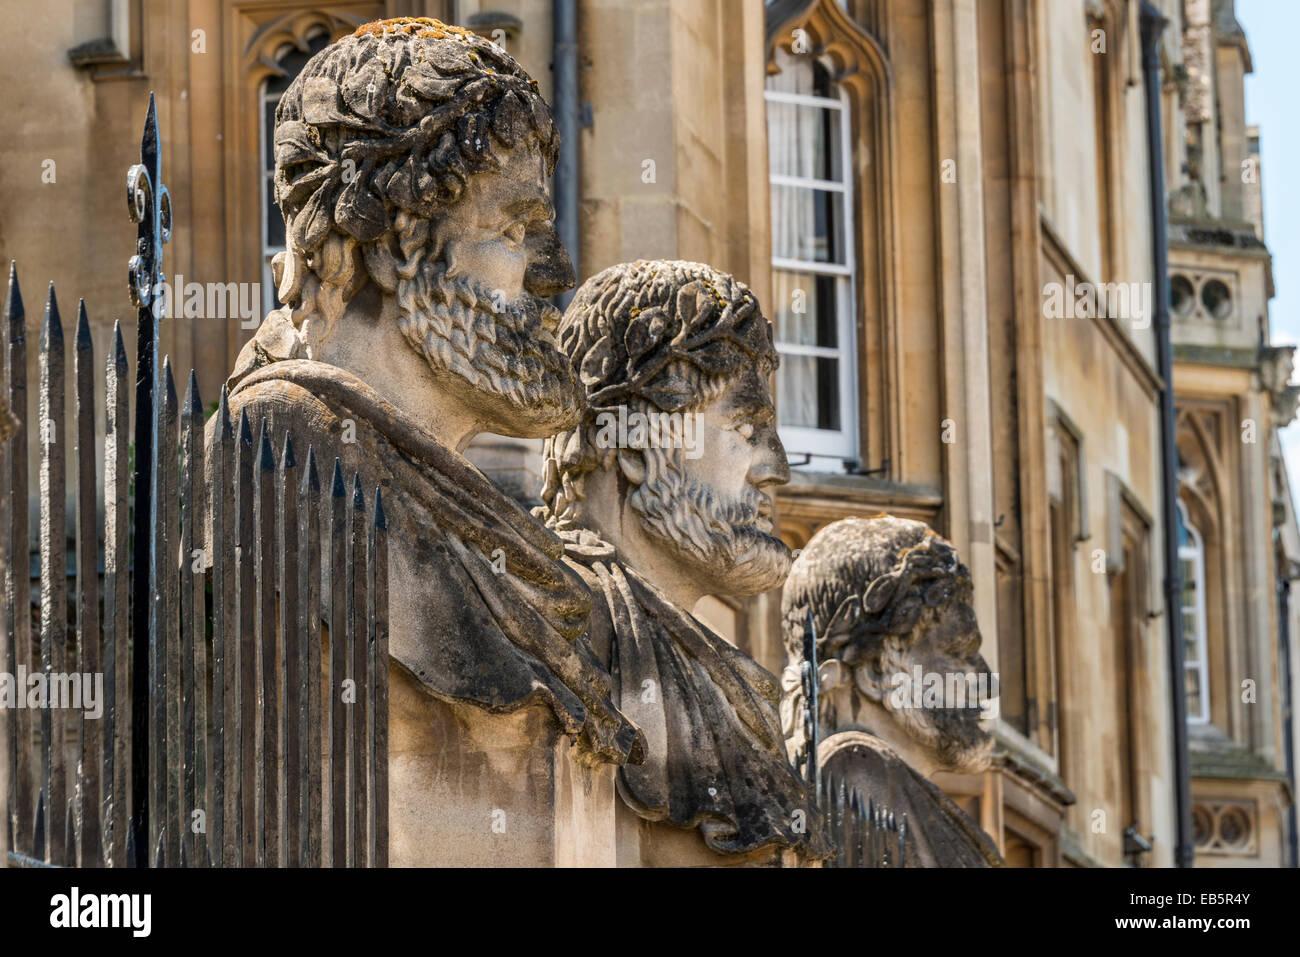 Grotesque decorative stone figure heads outside the Sheldonian Theatre, Oxford University Stock Photo